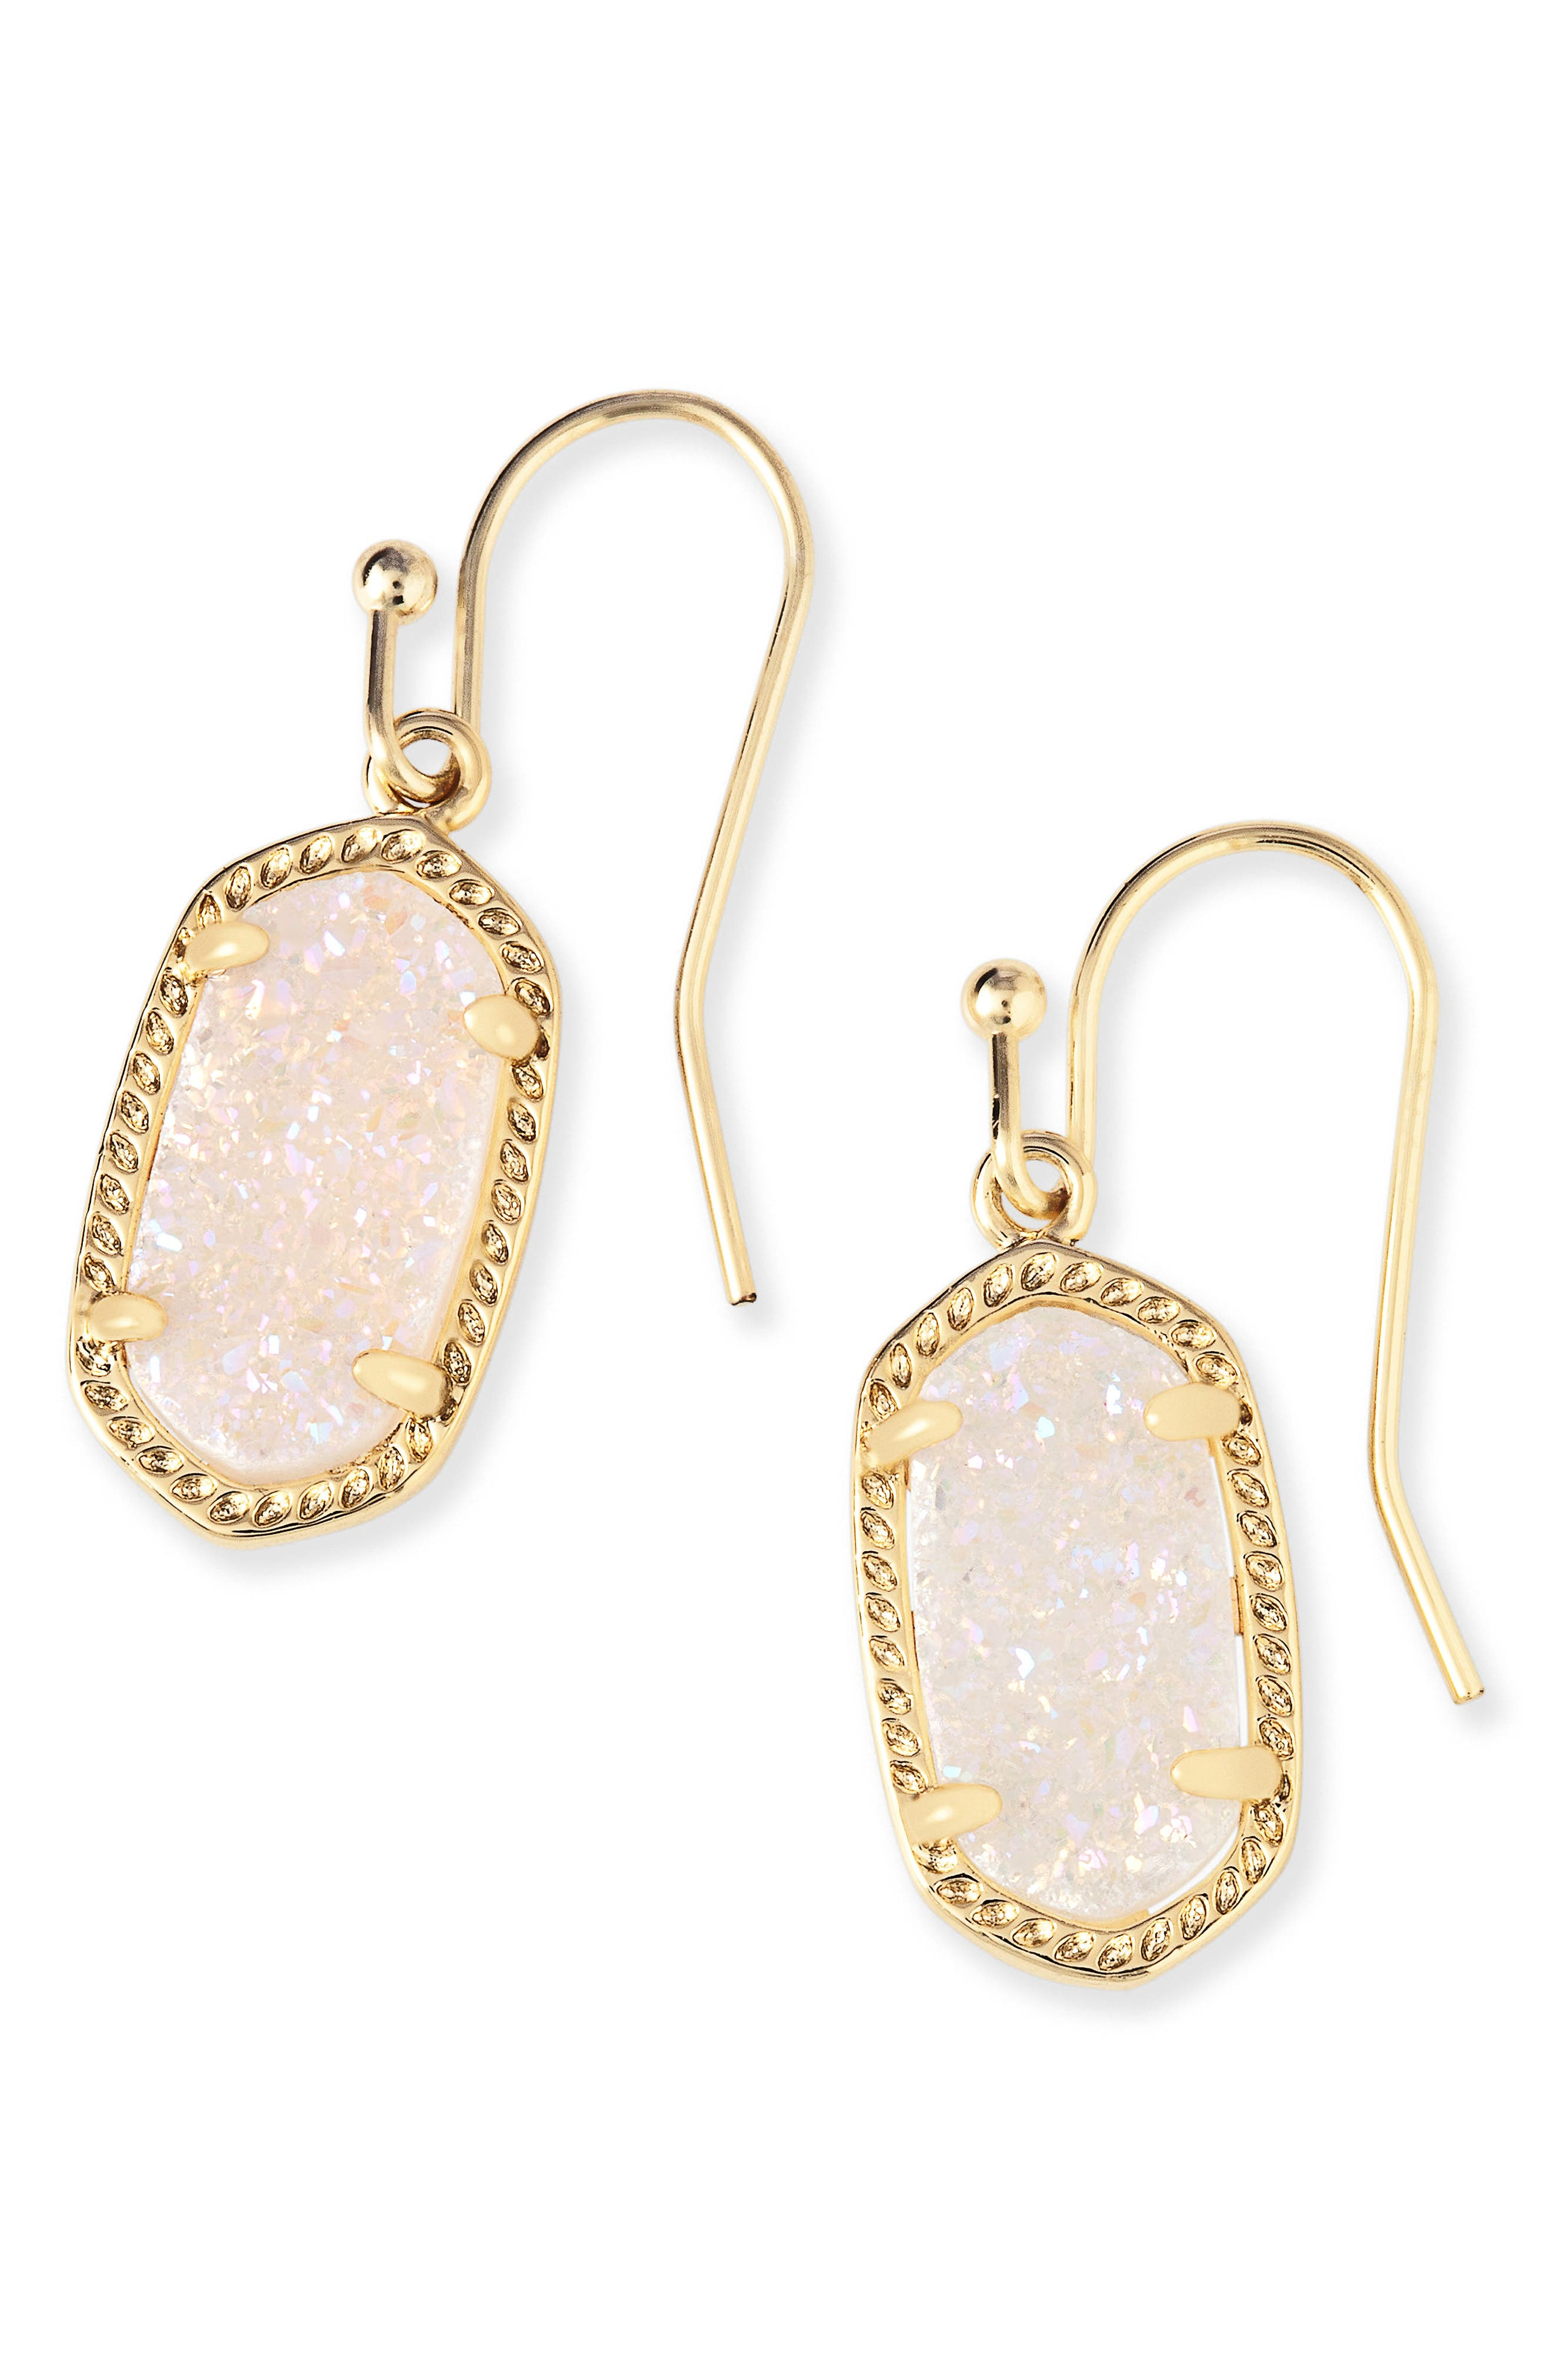 Main Image - Kendra Scott Lee Small Drop Earrings